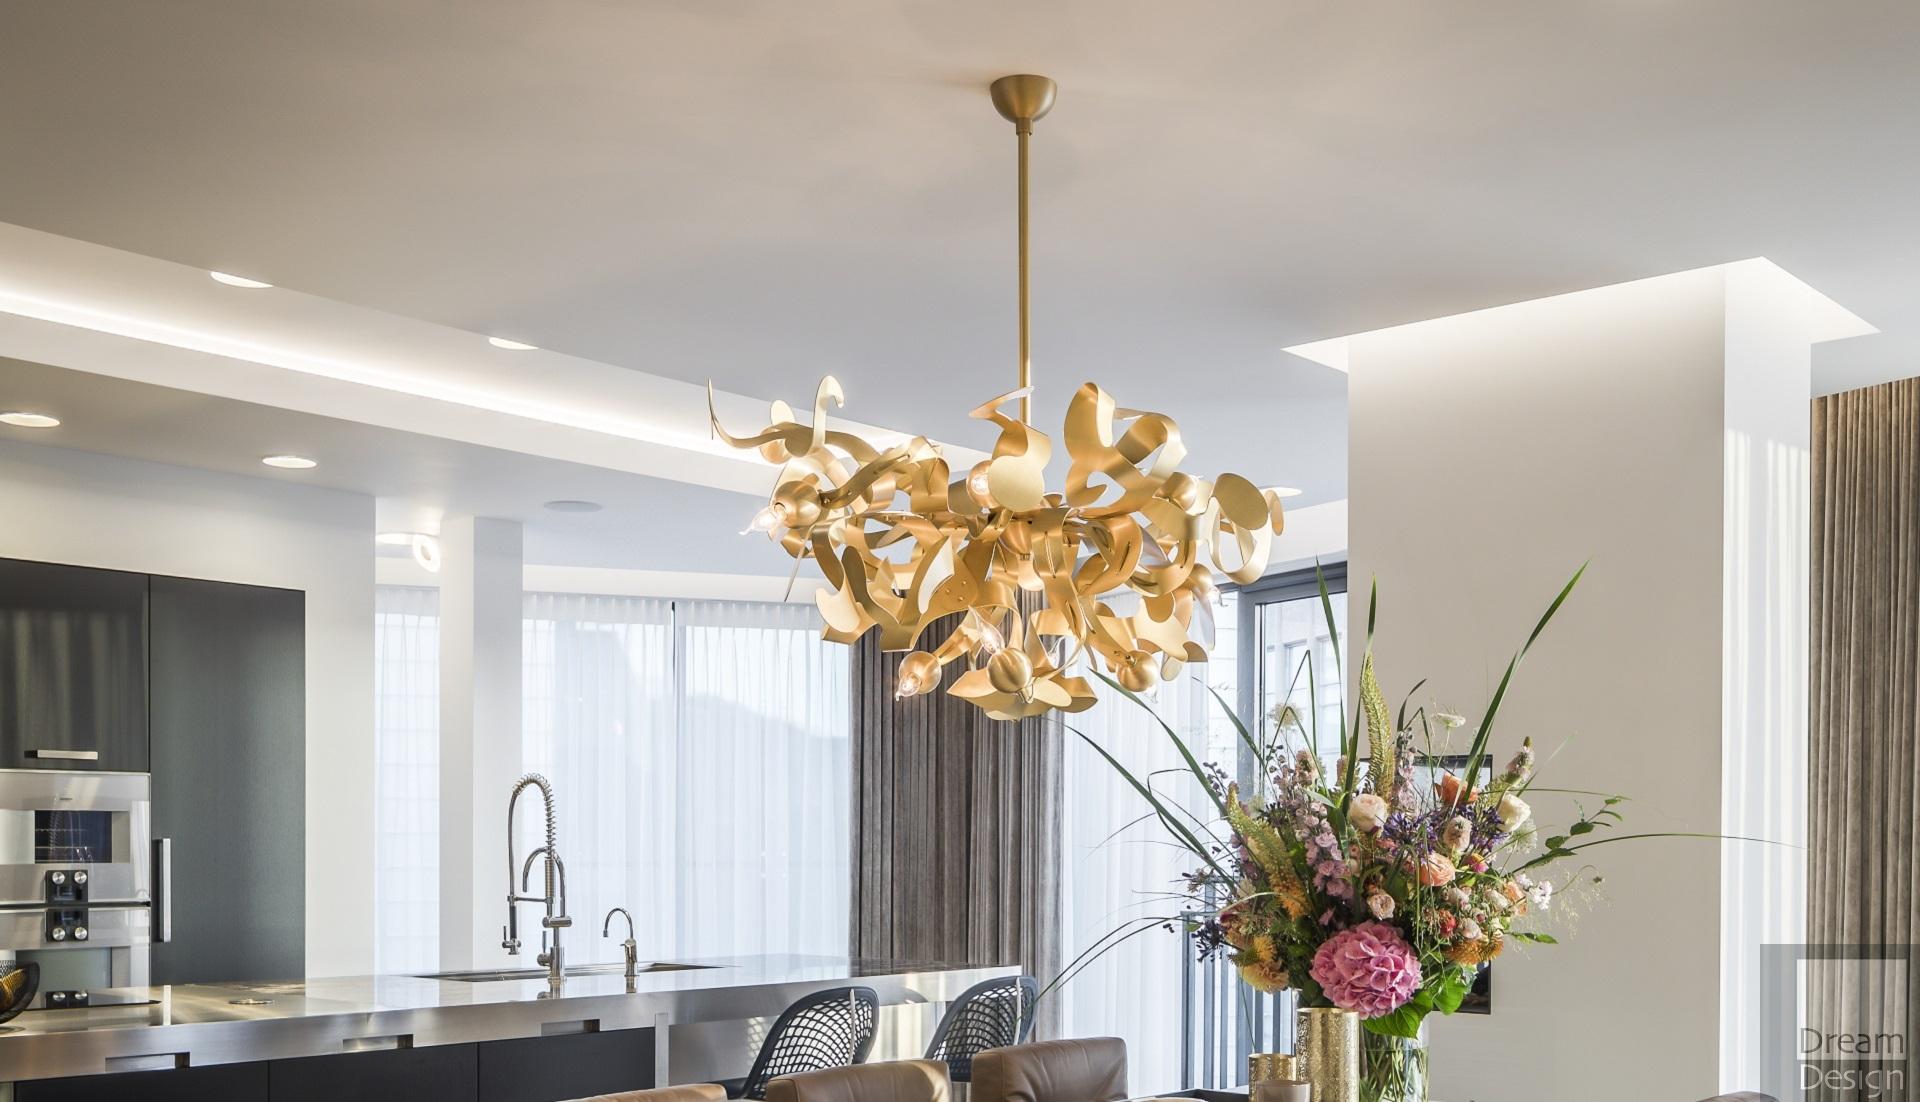 Brand Van Egmond Kelp Oval Chandelier - Dream Design Interiors Ltd